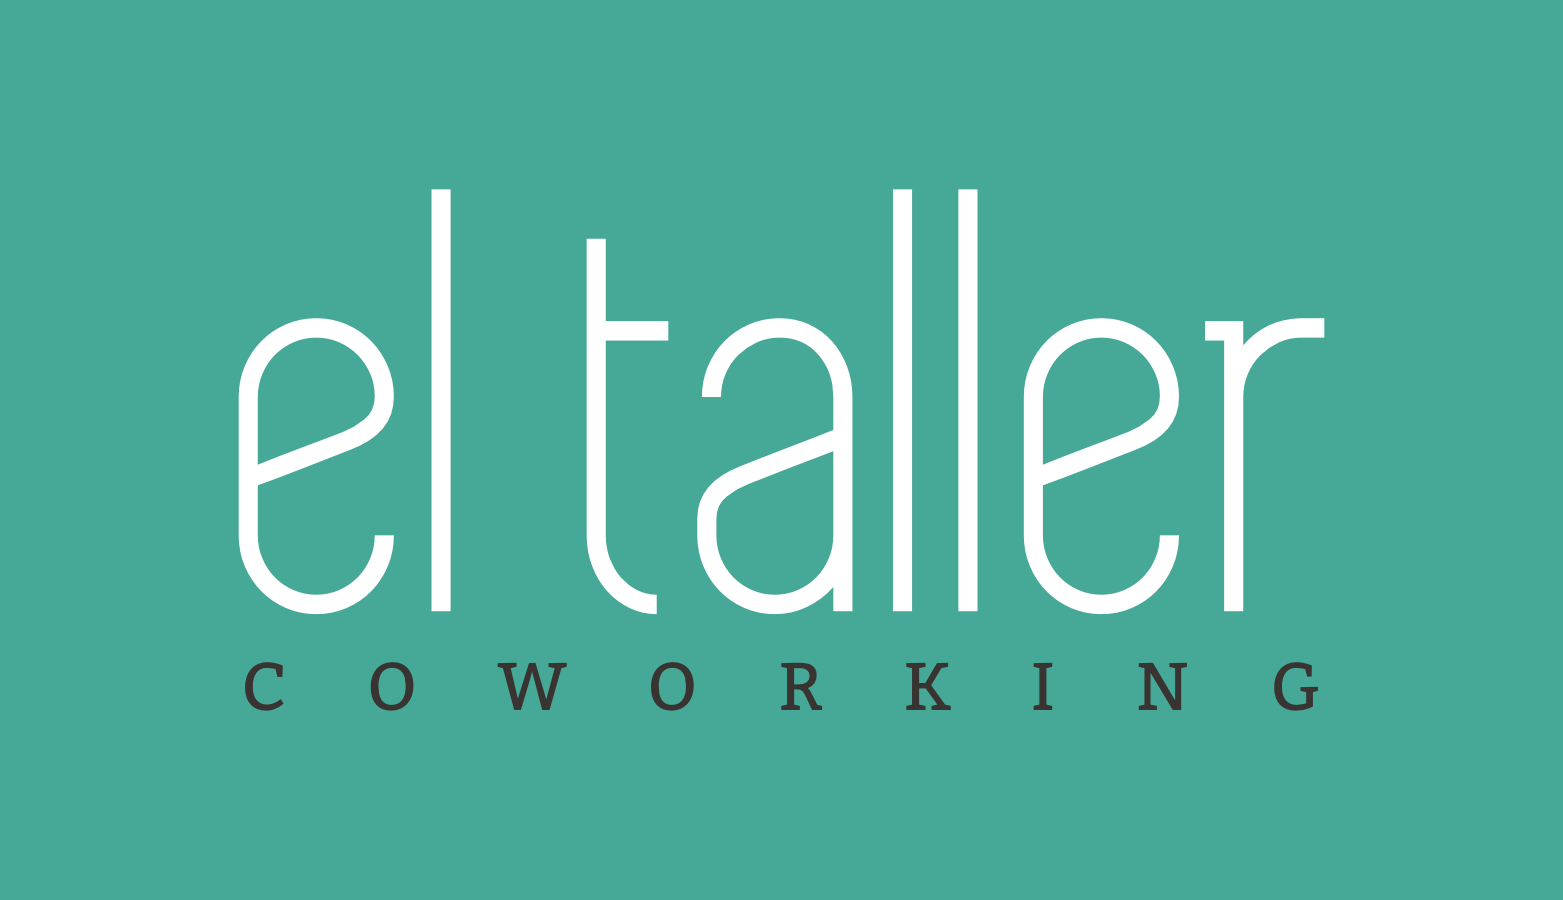 El taller coworking